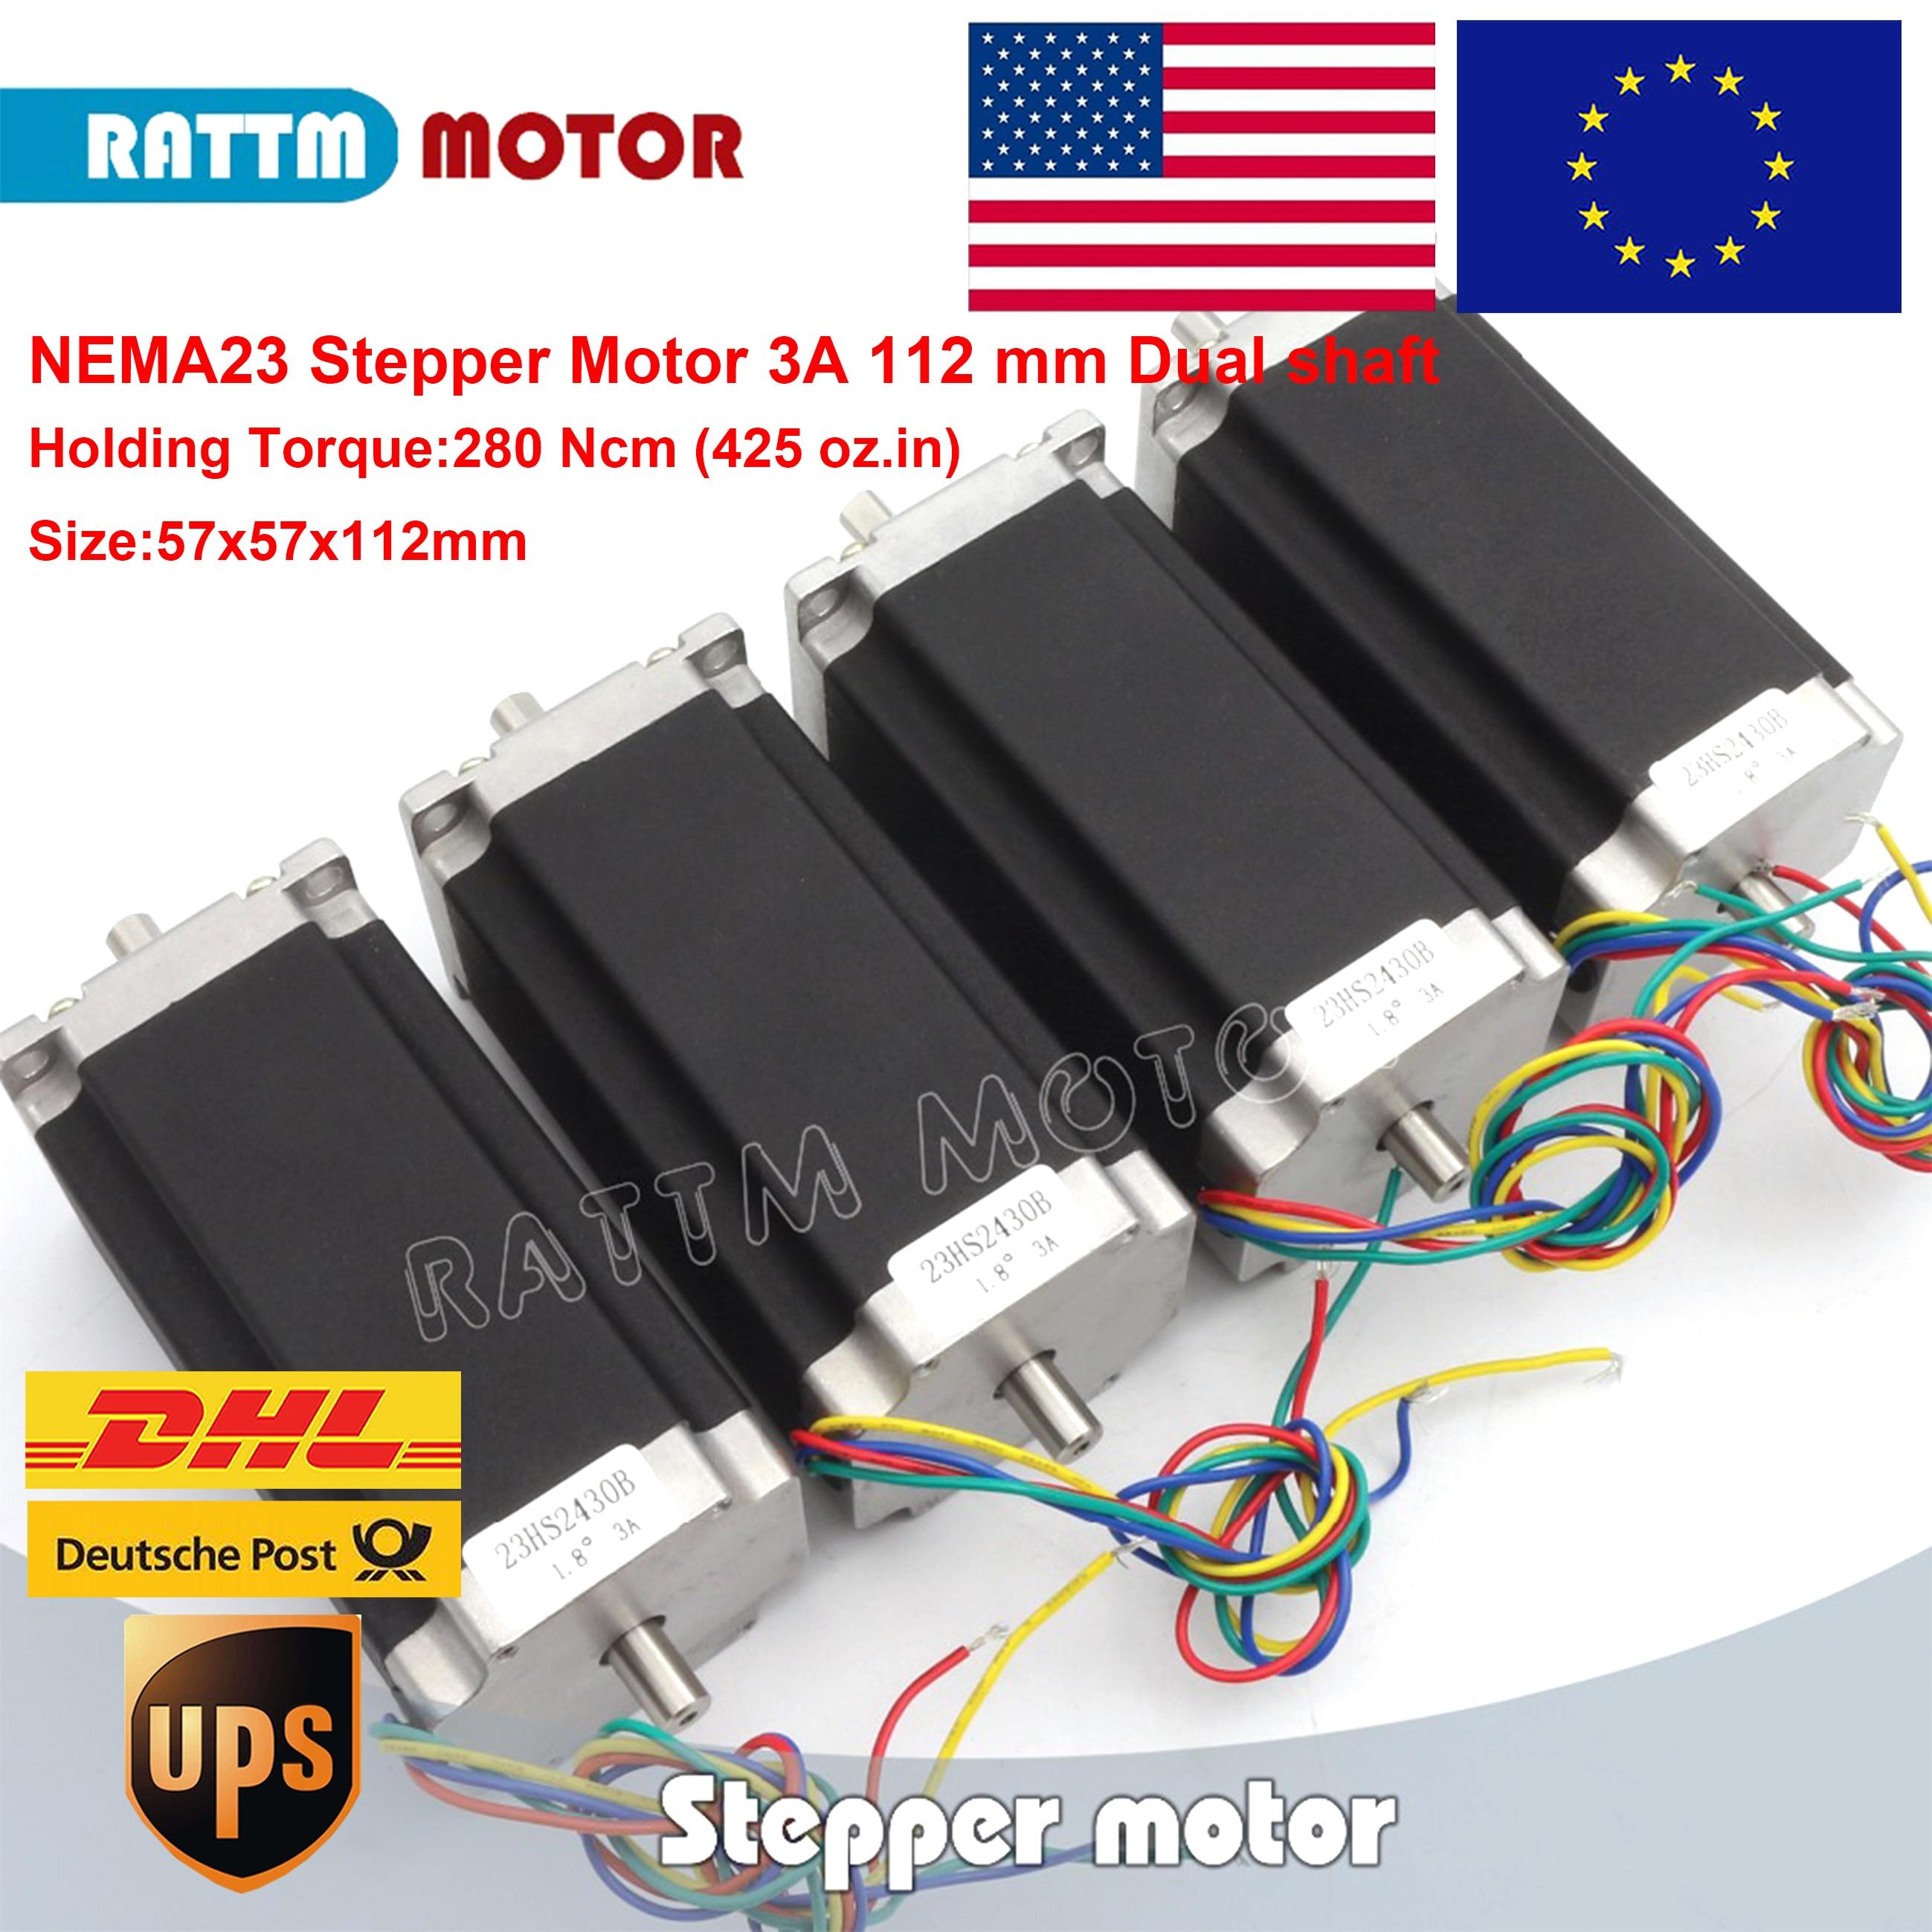 4pcs Nema 23 stepper motor Dual shaft 57x112mm 2.8N.cm 425 Oz-in 4 wires 3A for 3D printer parts CNC engraving machine 23HS2430B